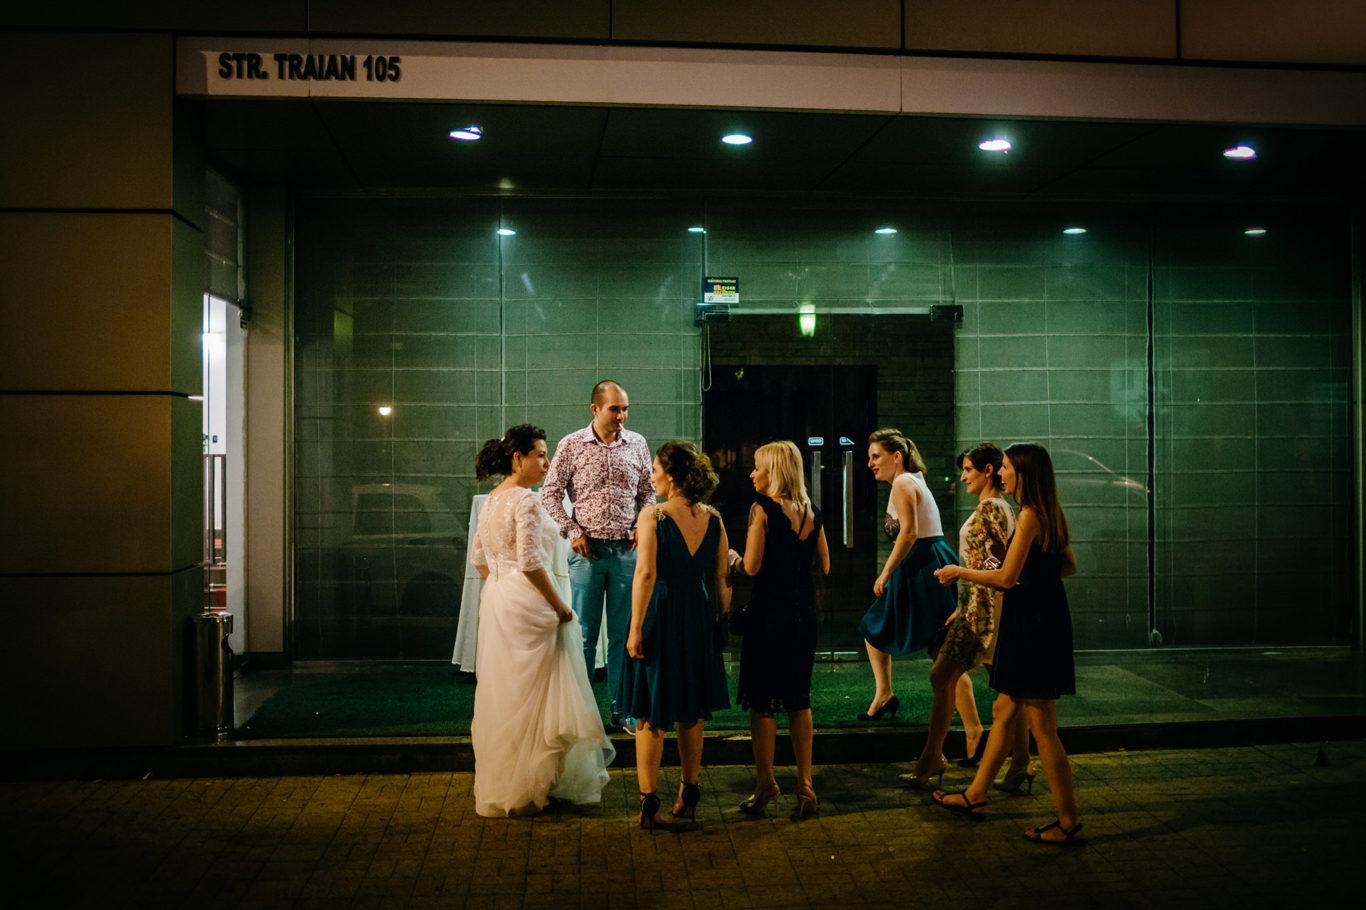 0738-fotografie-nunta-bucuresti-anca-george-fotograf-ciprian-dumitrescu-dcf_6220